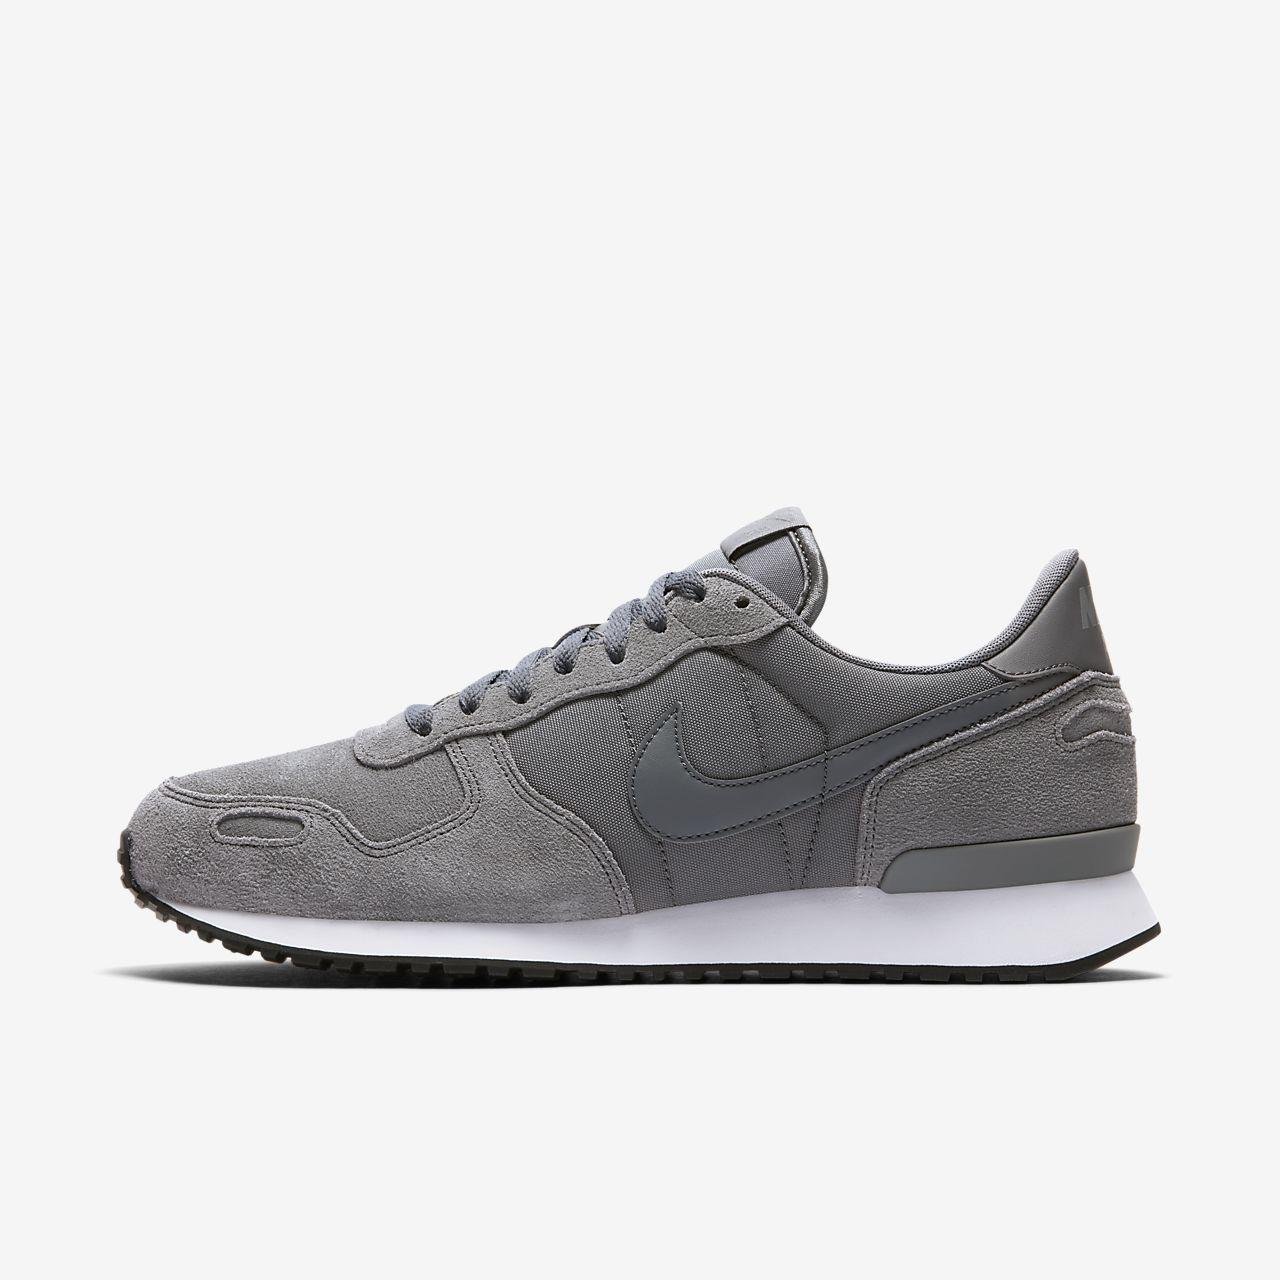 quality design f8d93 64b7f ... Nike Air Vortex Zapatillas - Hombre